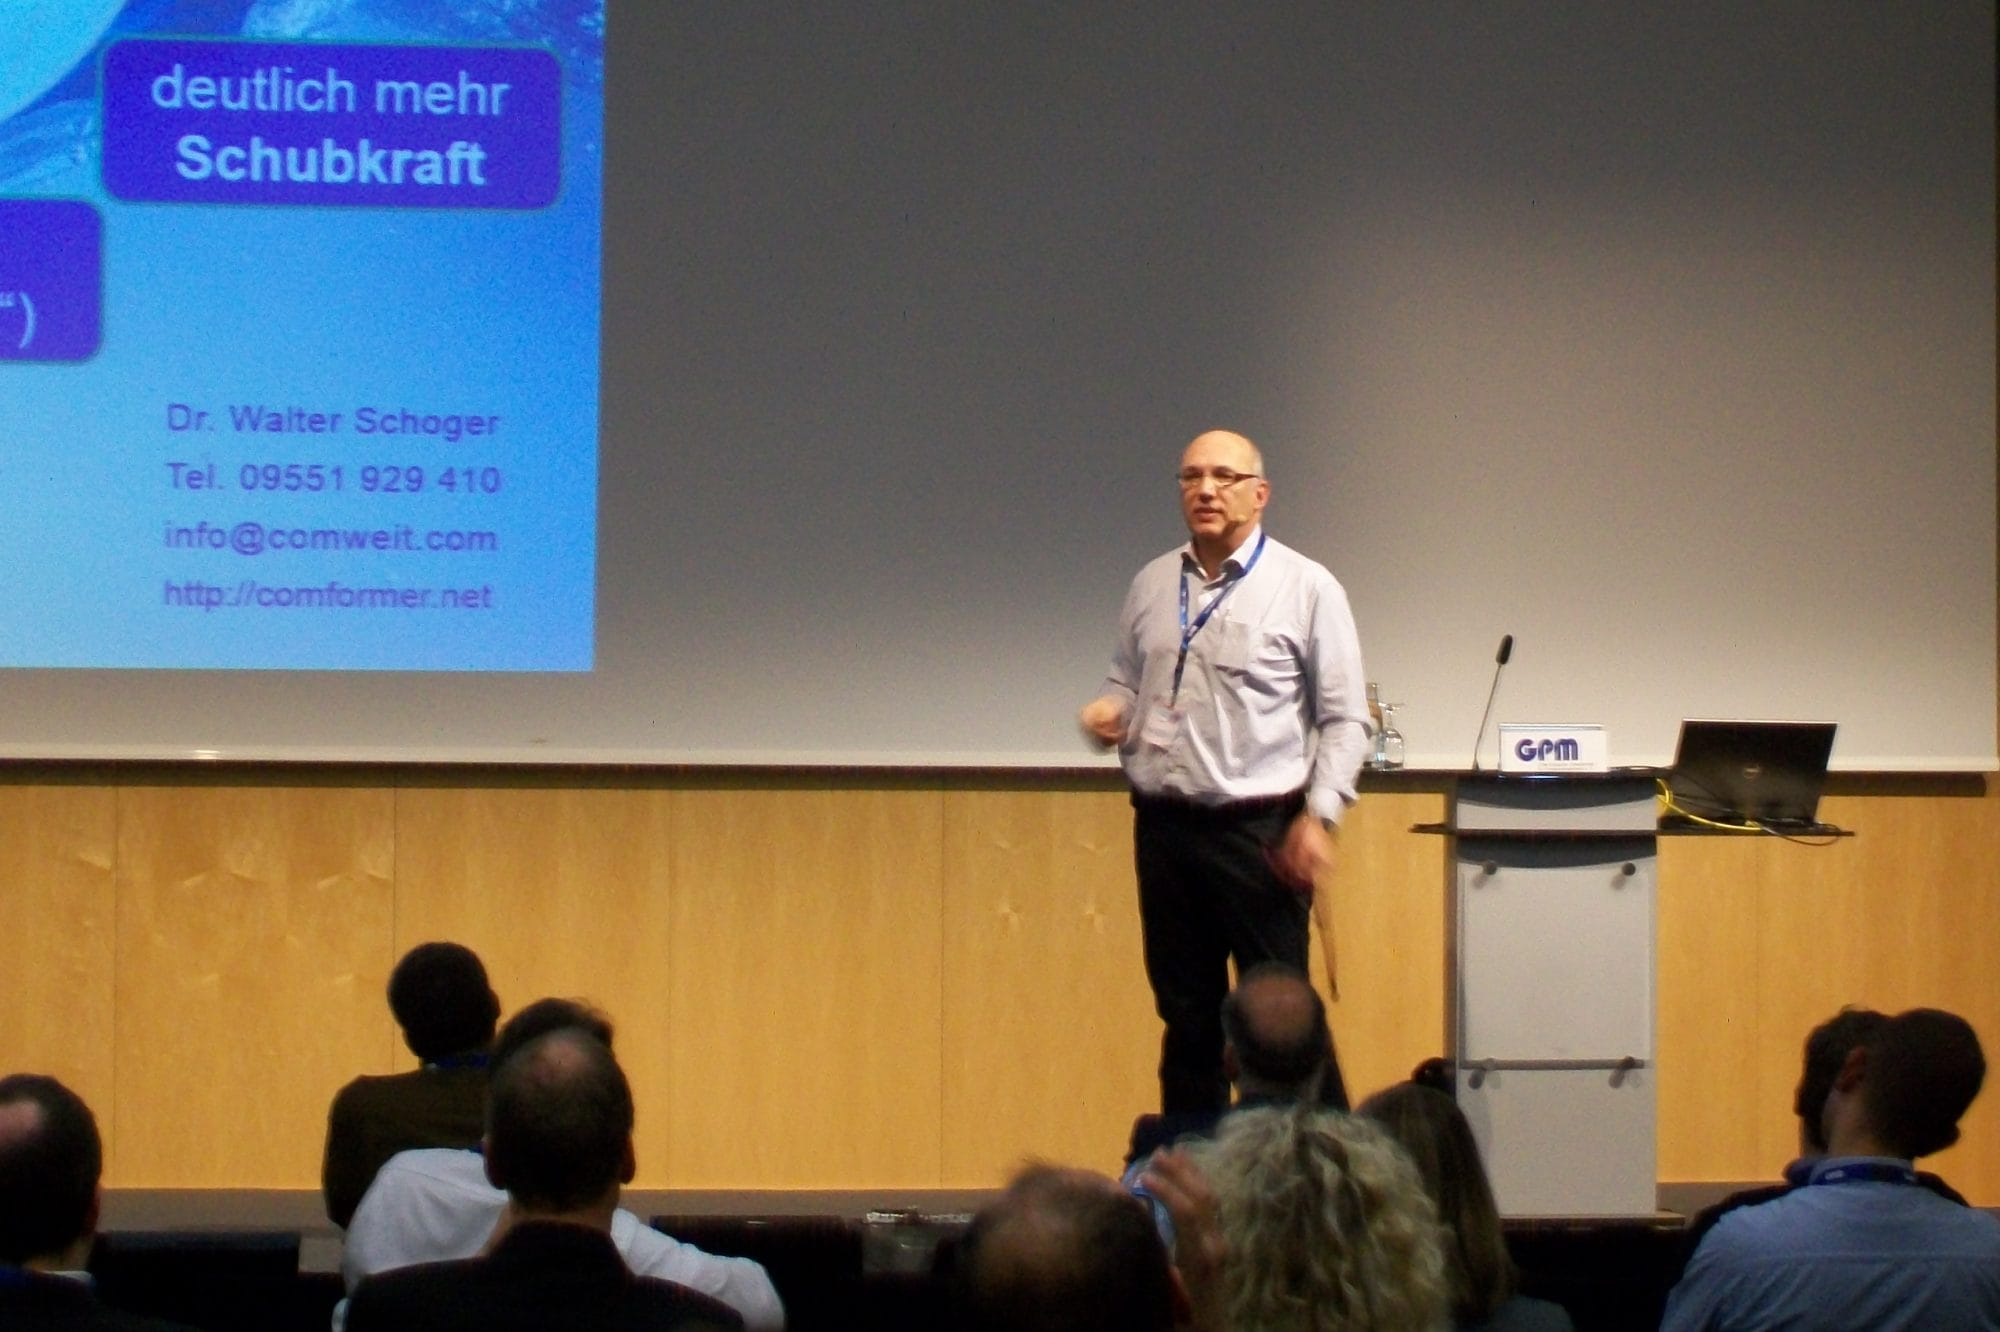 Dr. Walter Schoger: comforming als innovatives Beratungskonzept am pm-forum Nürnberg